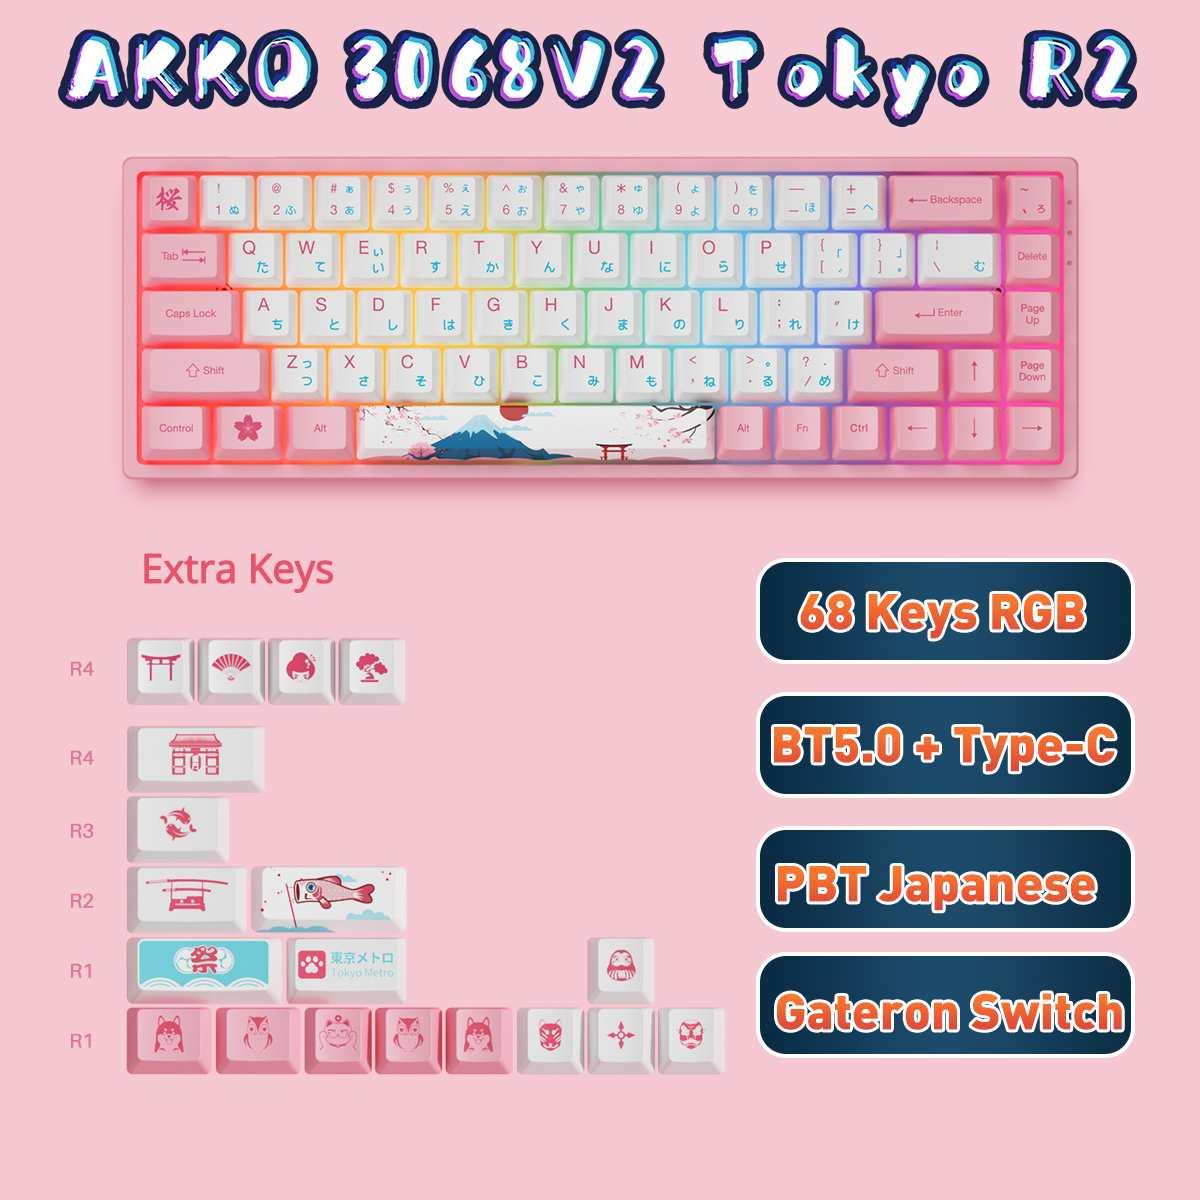 AKKO 3068V2 طوكيو R2 لوحة المفاتيح الميكانيكية 68 مفاتيح الوضع المزدوج BT5.0 Type-C RGB Gamer لوحة المفاتيح Gateron التبديل PBT اليابانية Keycap